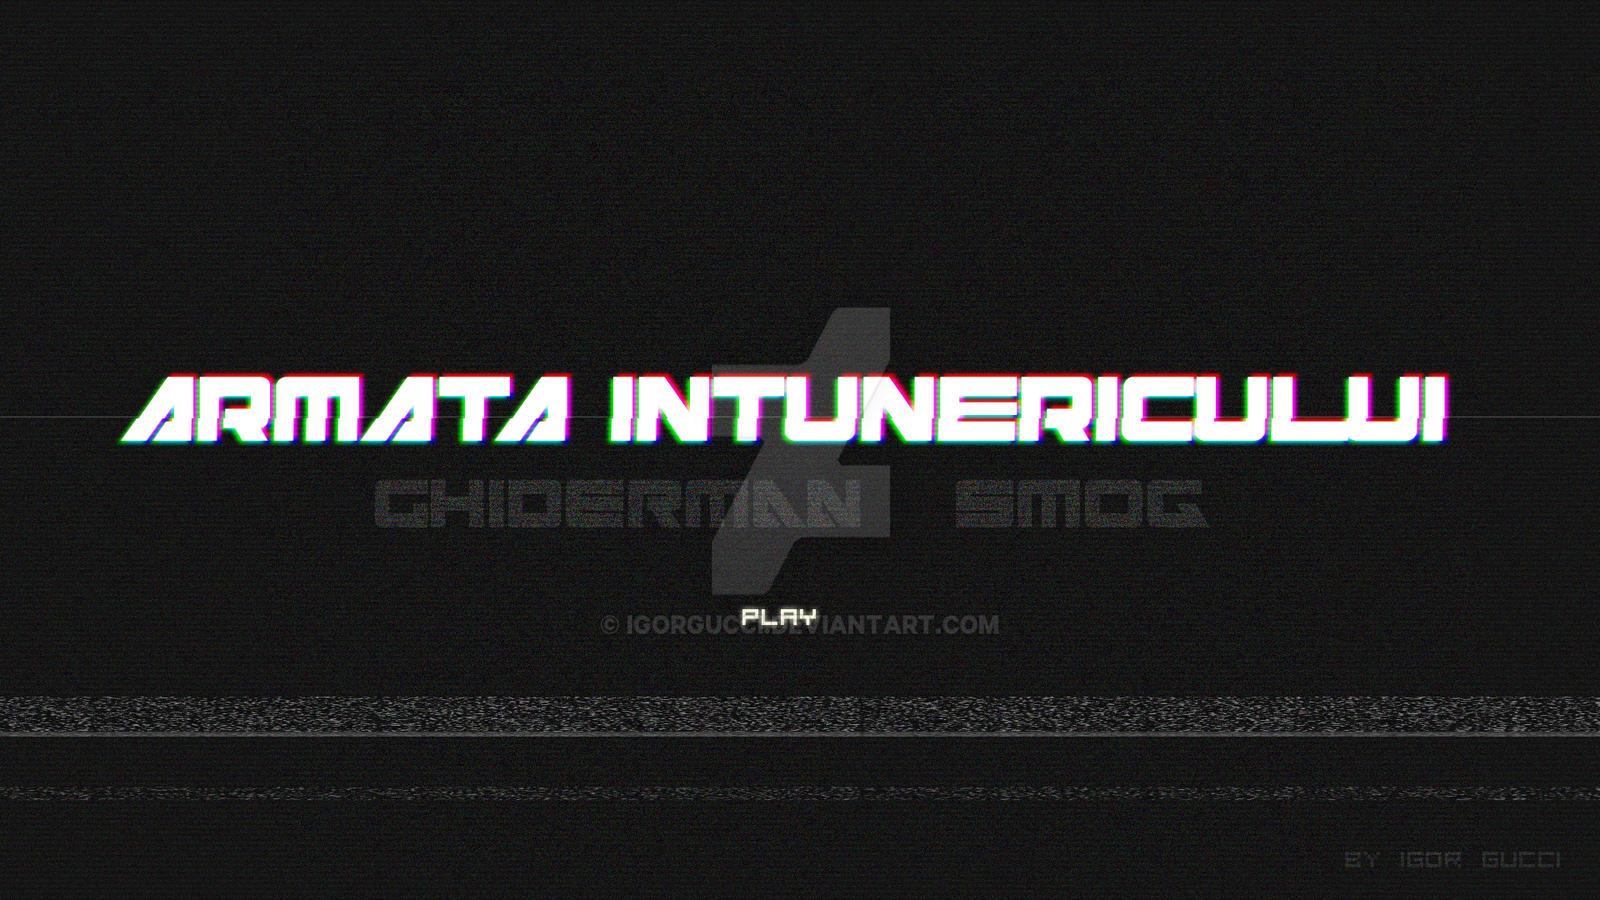 Armata Intunericului [YouTube Cover] by igorgucci